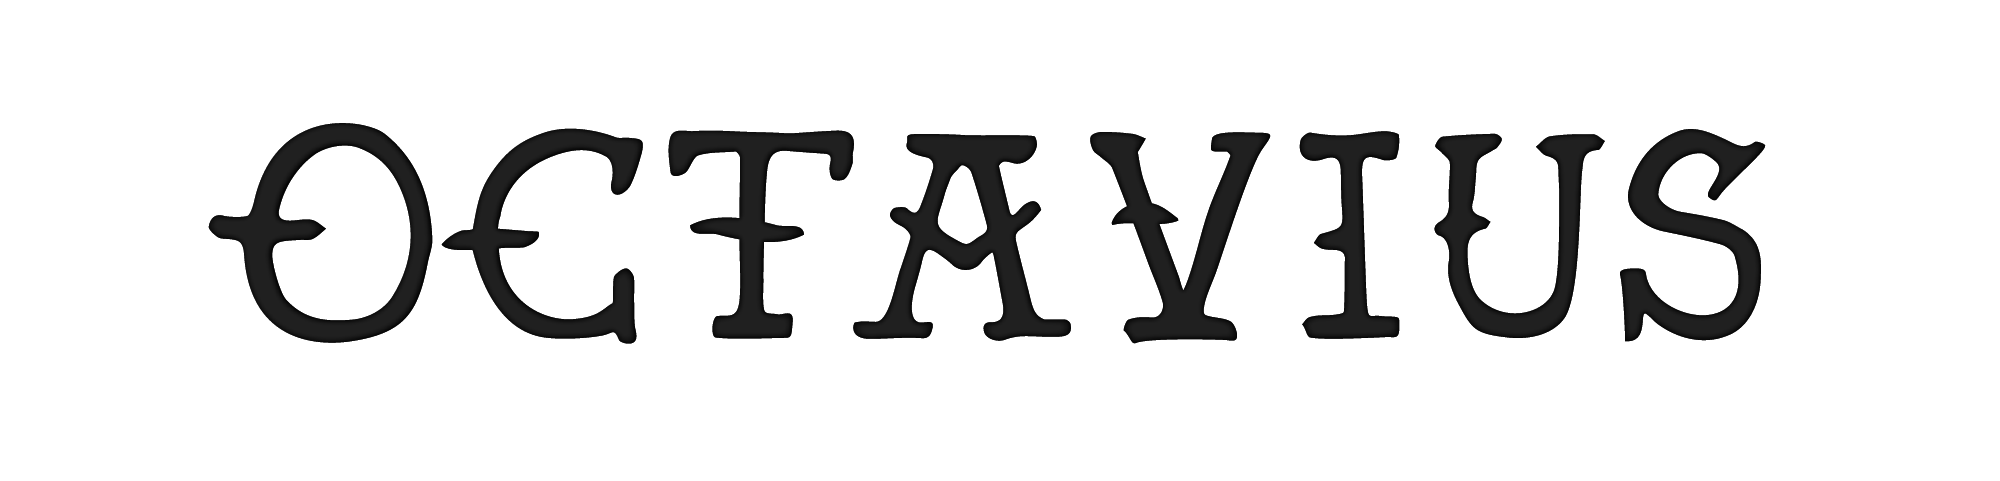 Hand-Drawn Wordmark